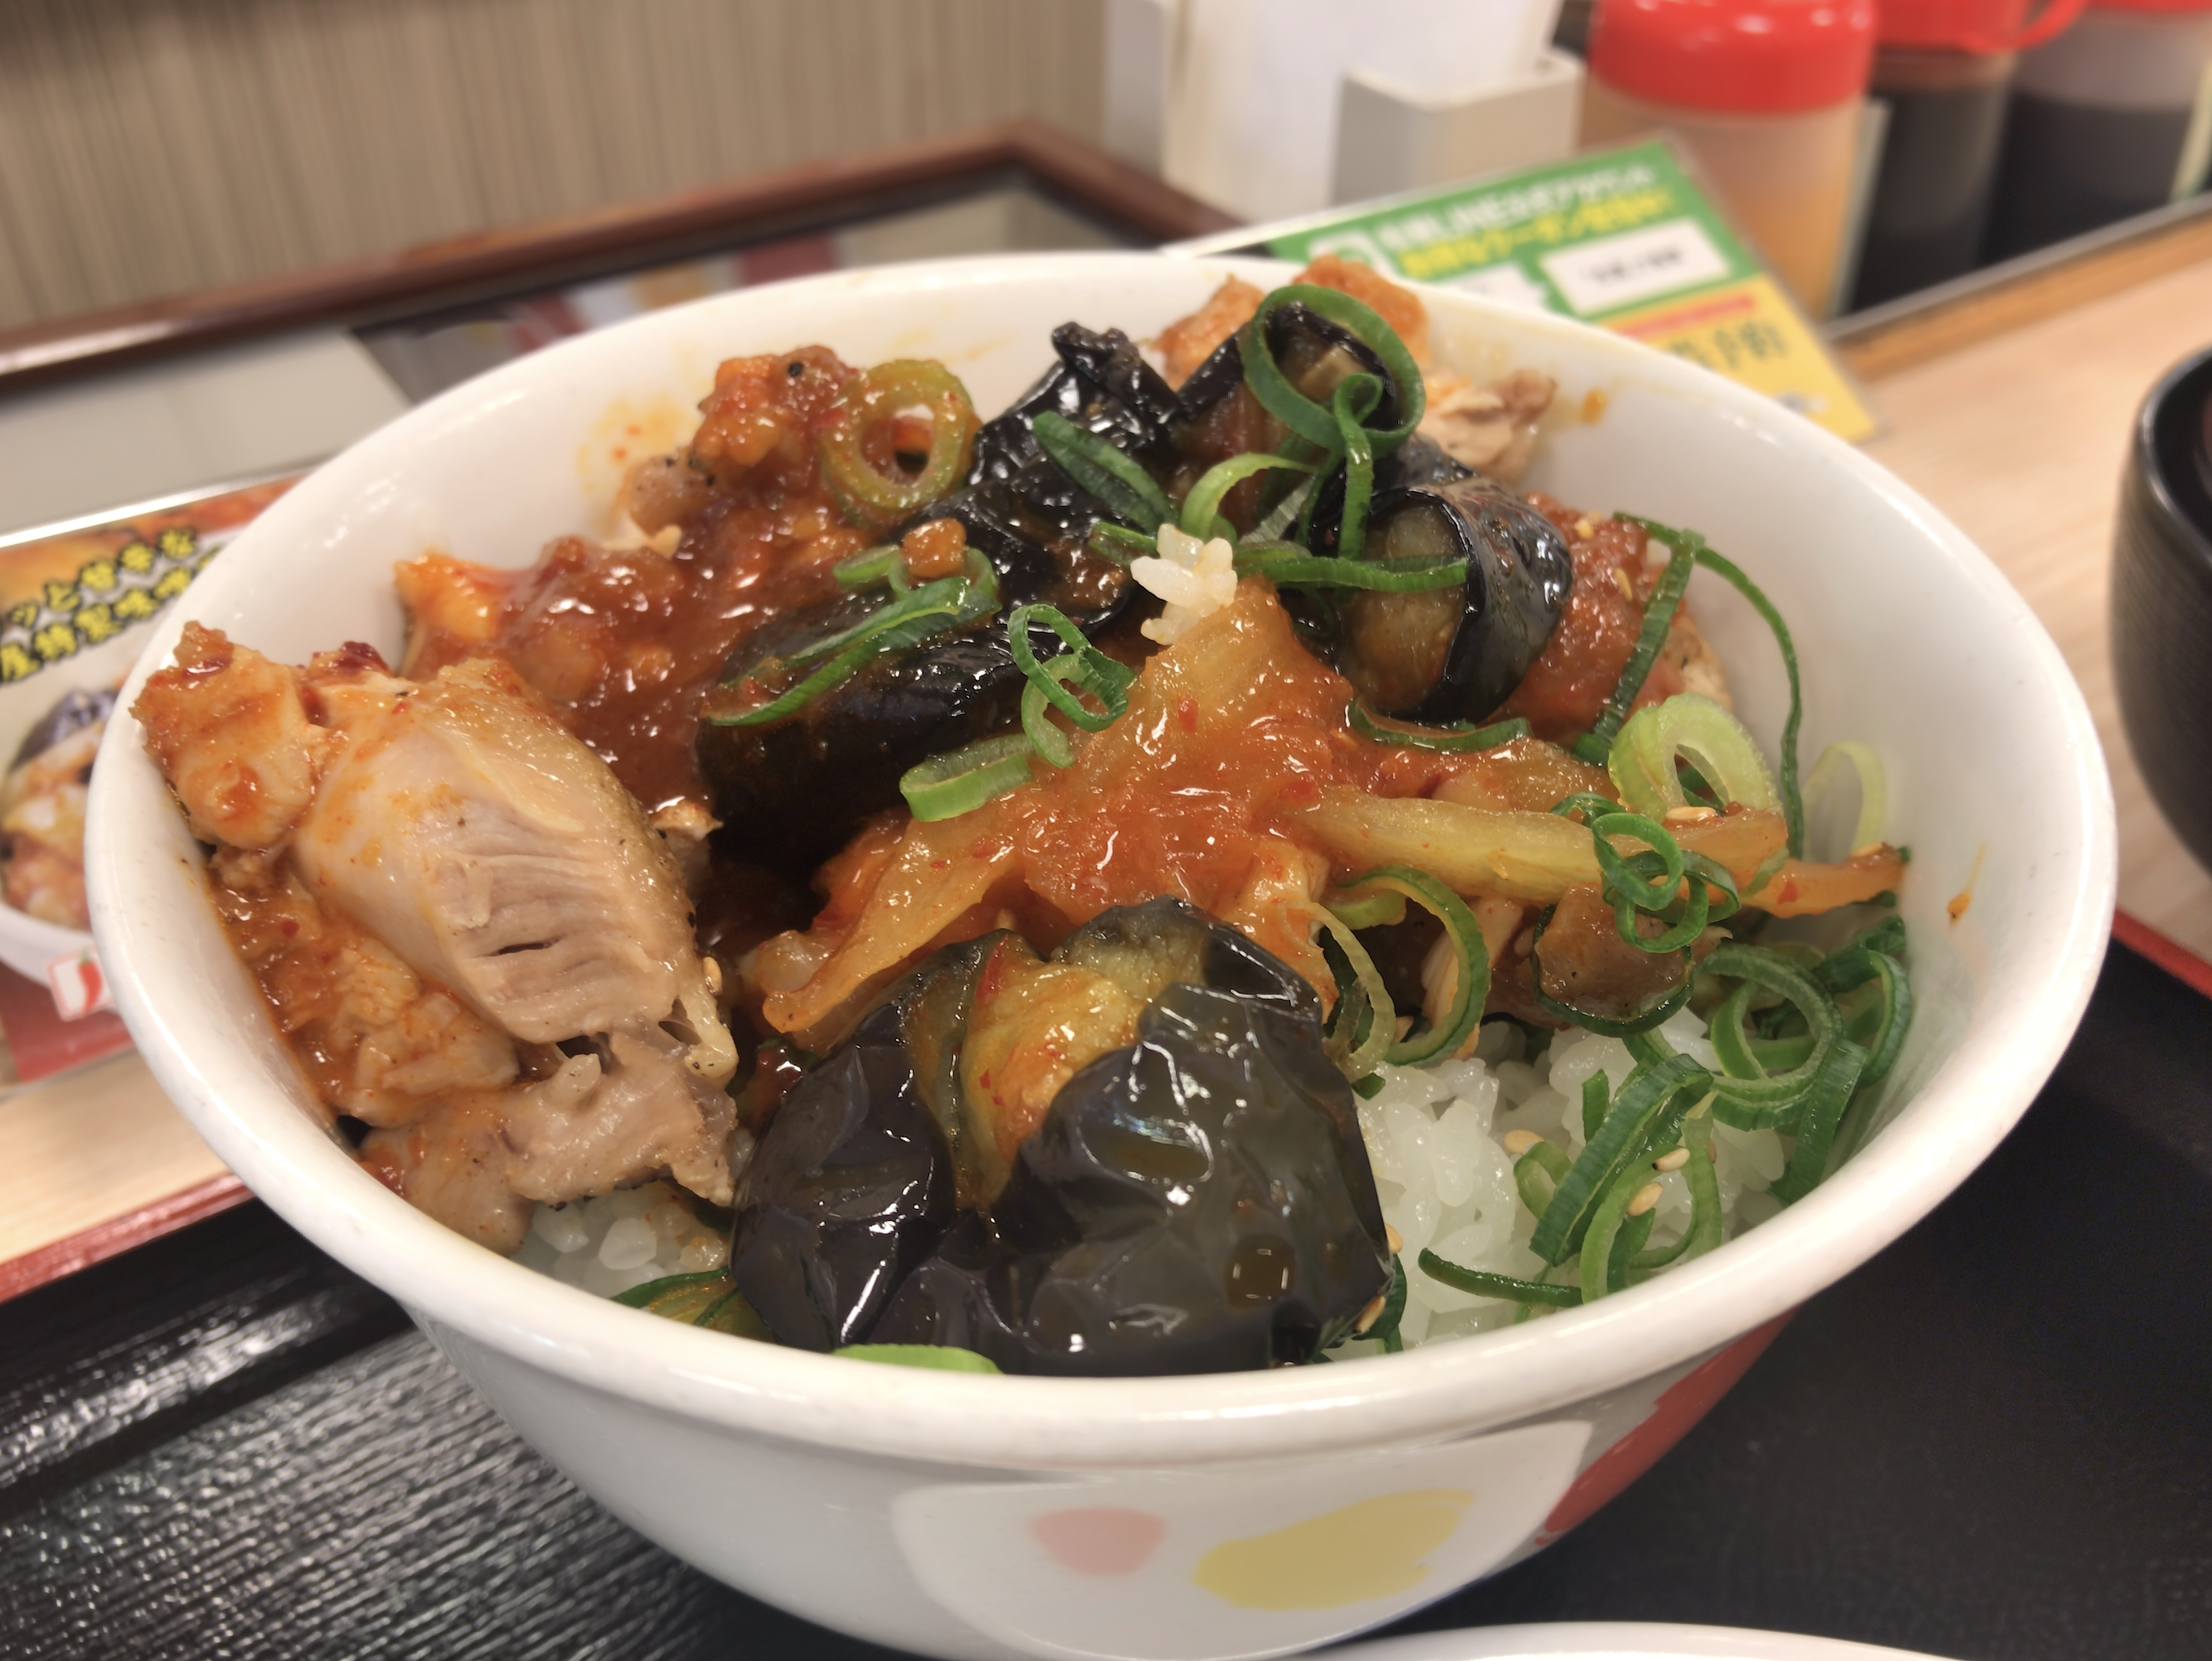 [松屋][鶏の甘辛味噌定食][税込み630円][991kcal]